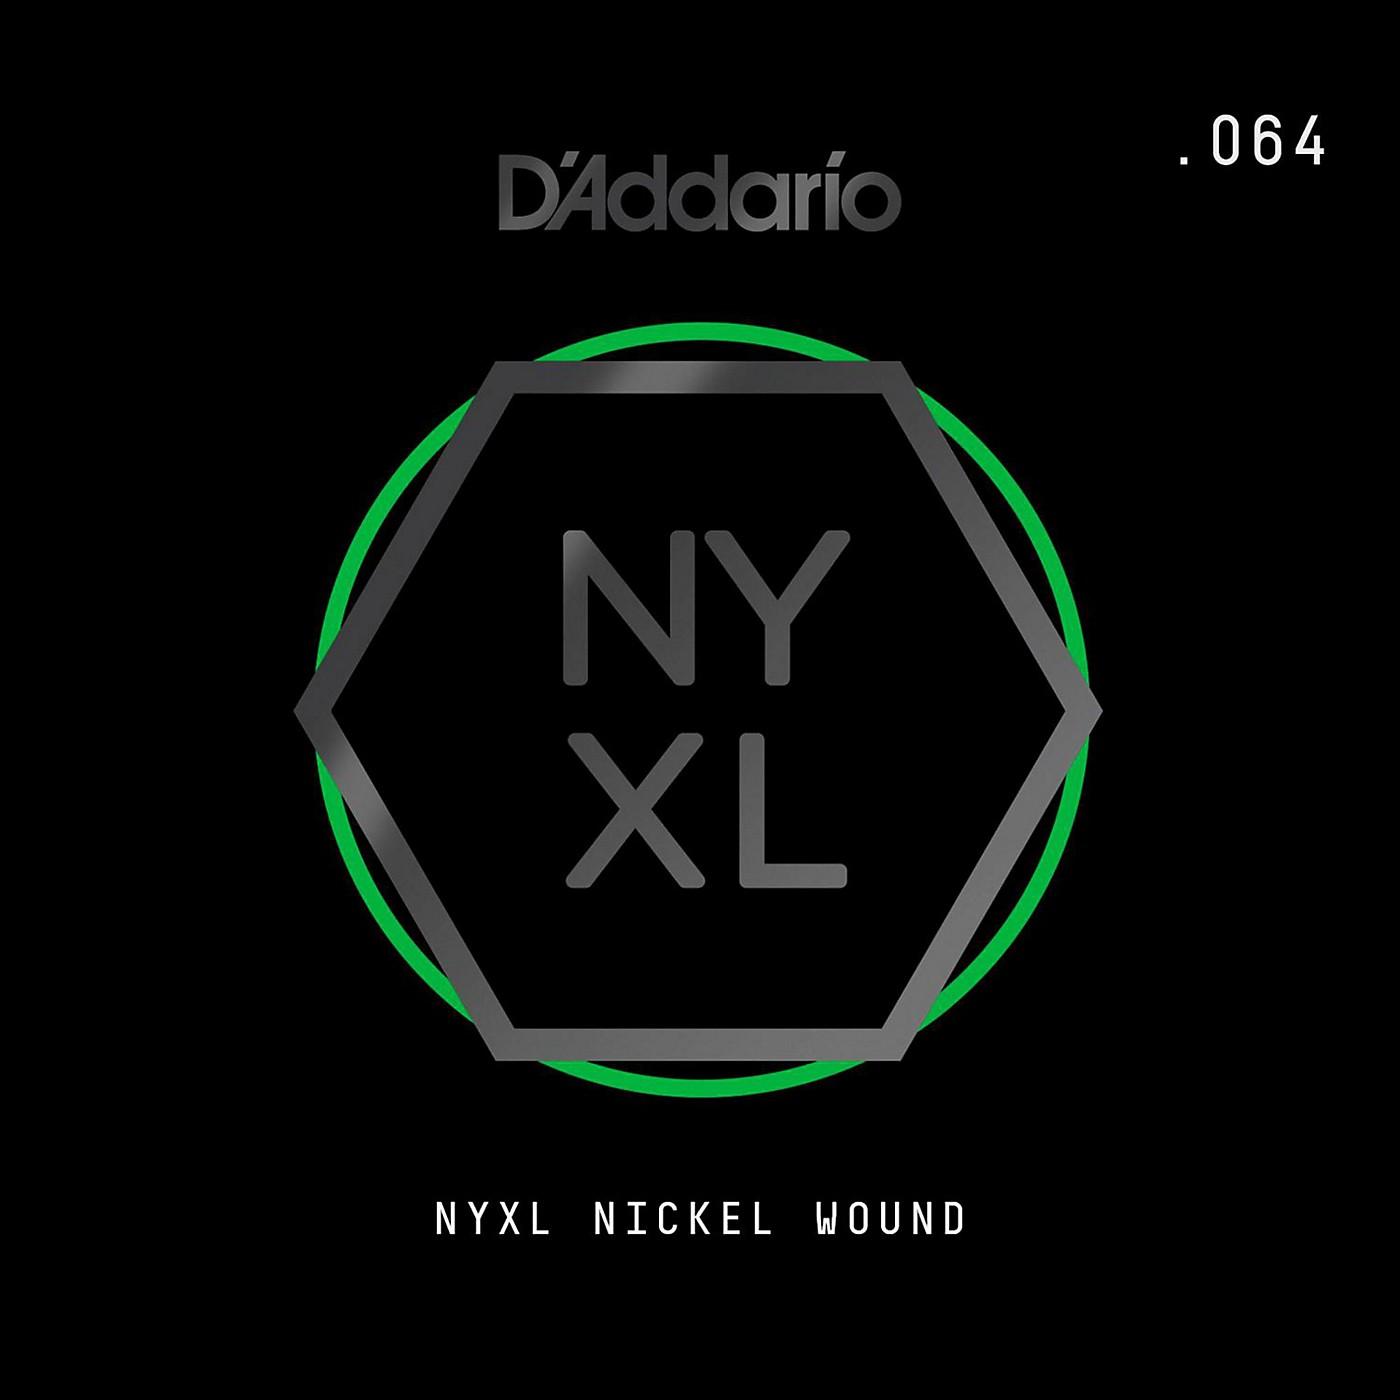 D'Addario NYXL Single Wound 064 Electric Guitar Strings thumbnail